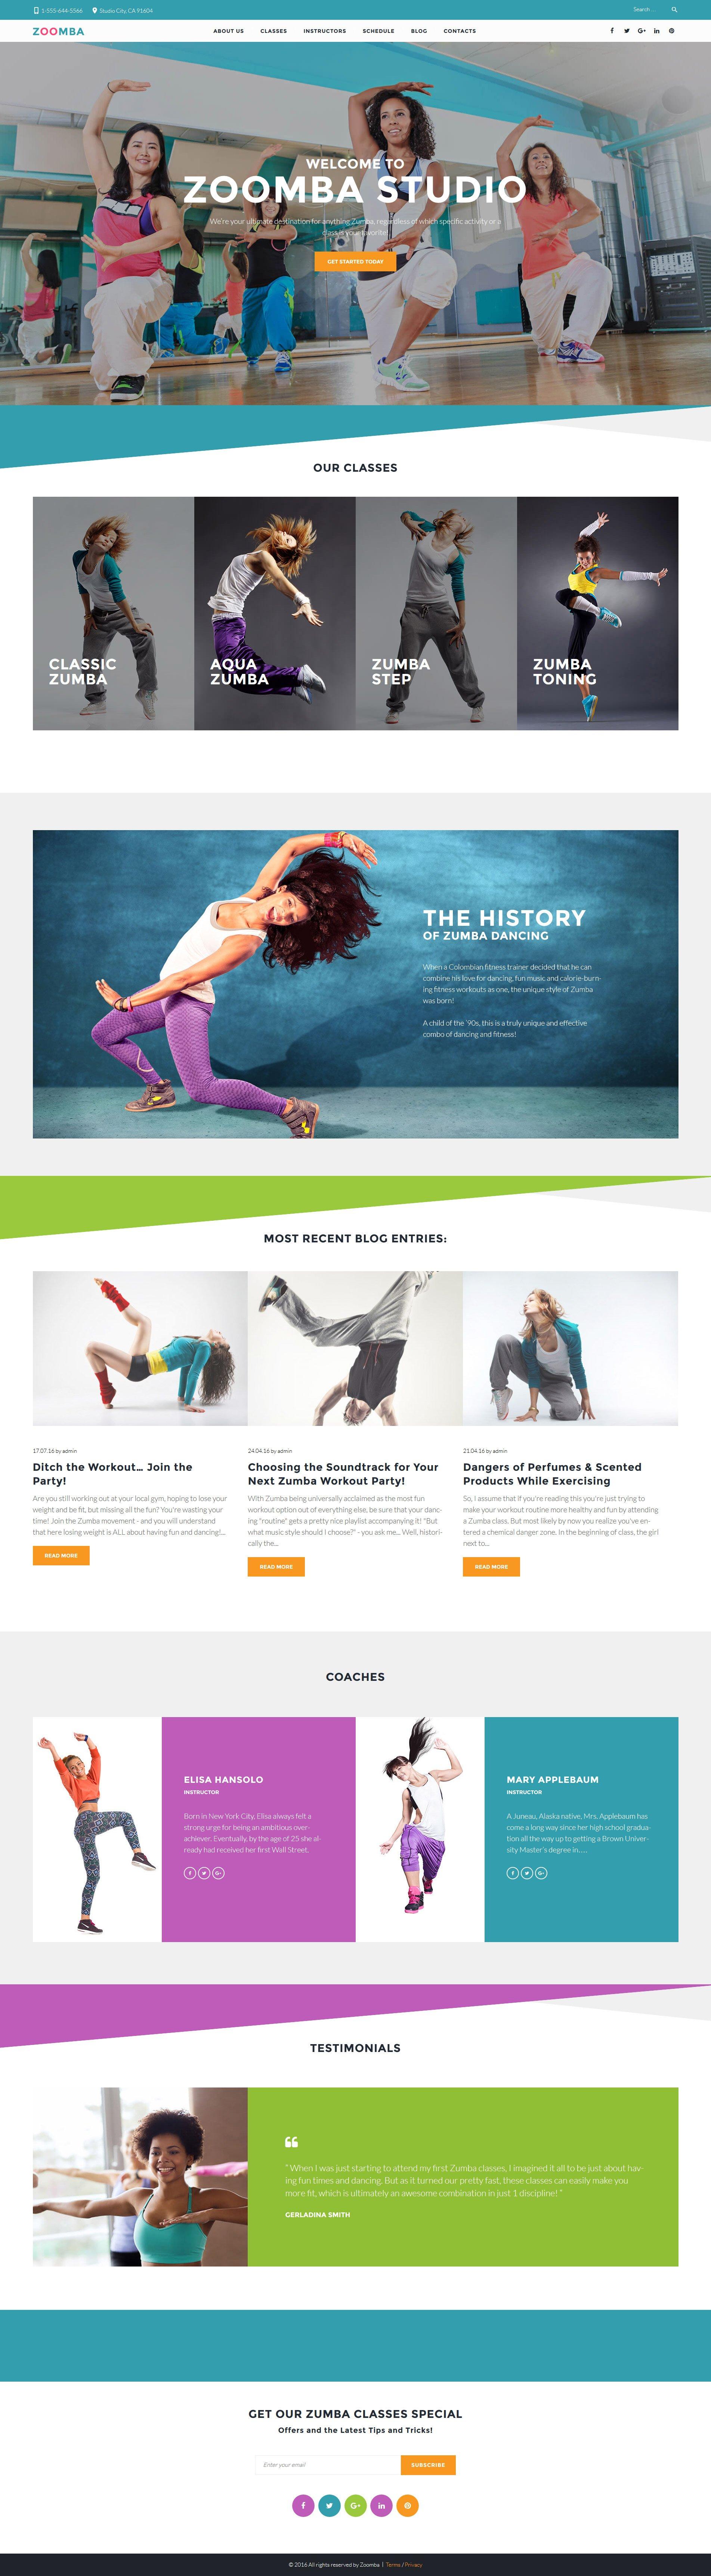 Zoomba - Zoomba Dance Studio №61364 - скриншот